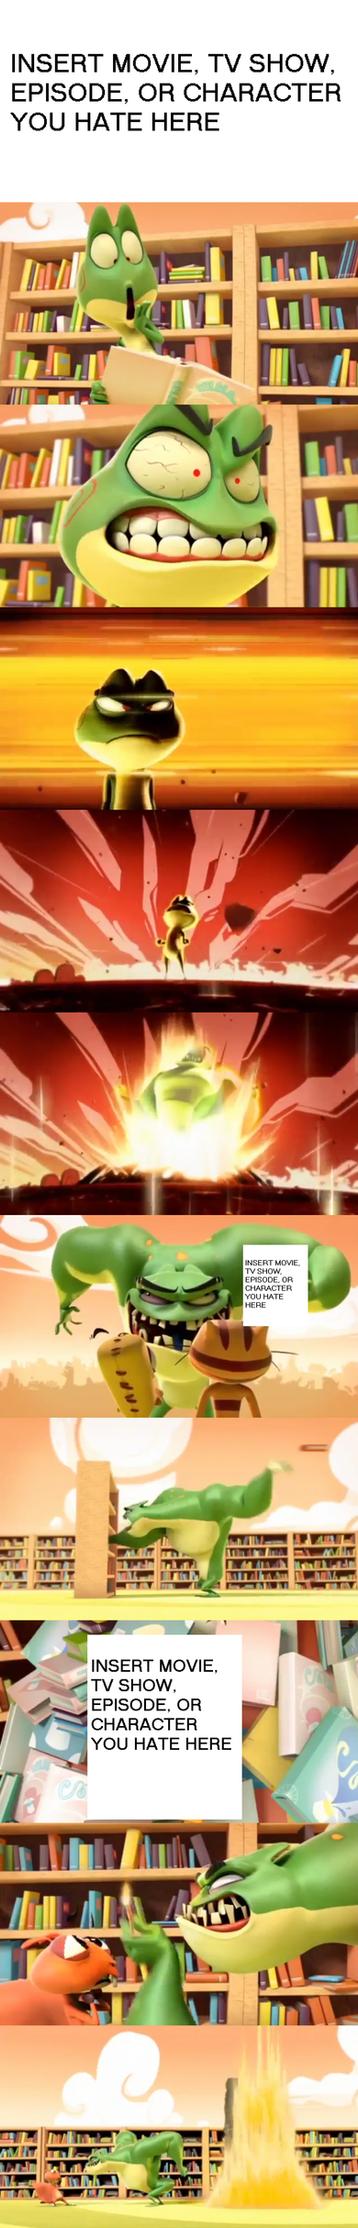 Kaeloo's Reaction to Something Meme by Prentis-65